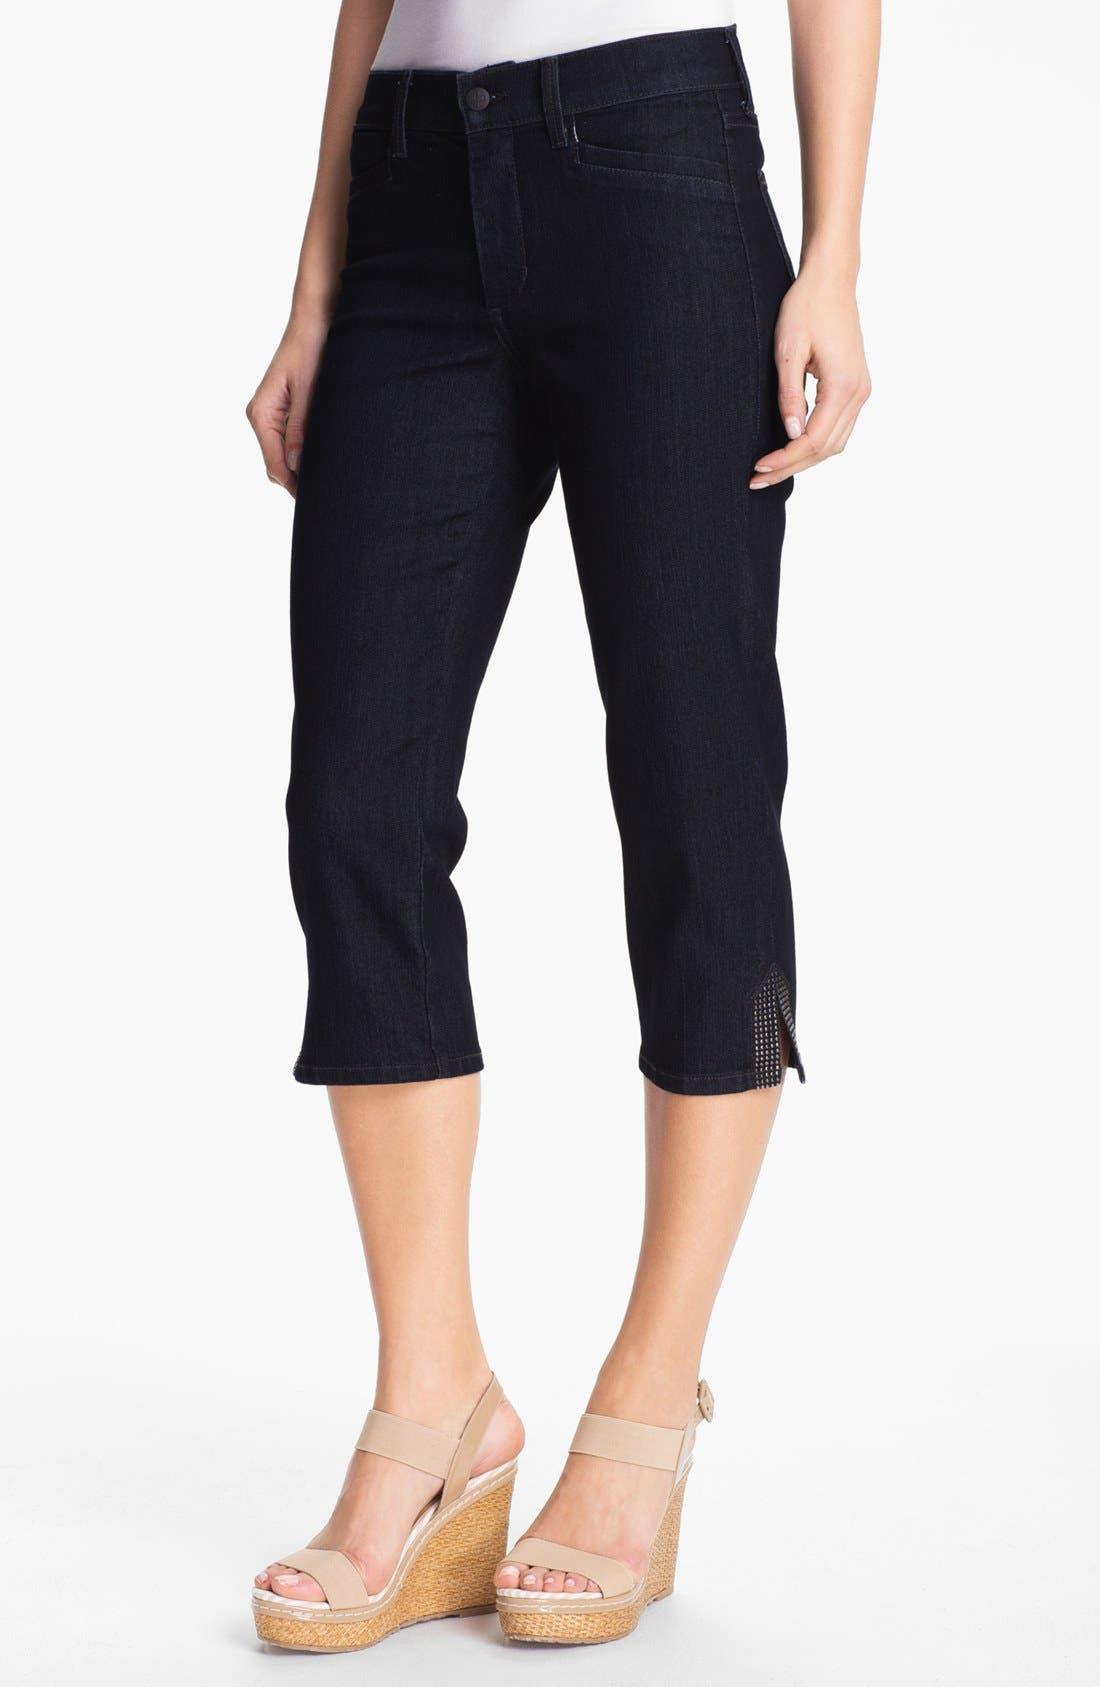 Alternate Image 1 Selected - NYDJ 'Suzy' Embellished Crop Jeans (Plus Size)